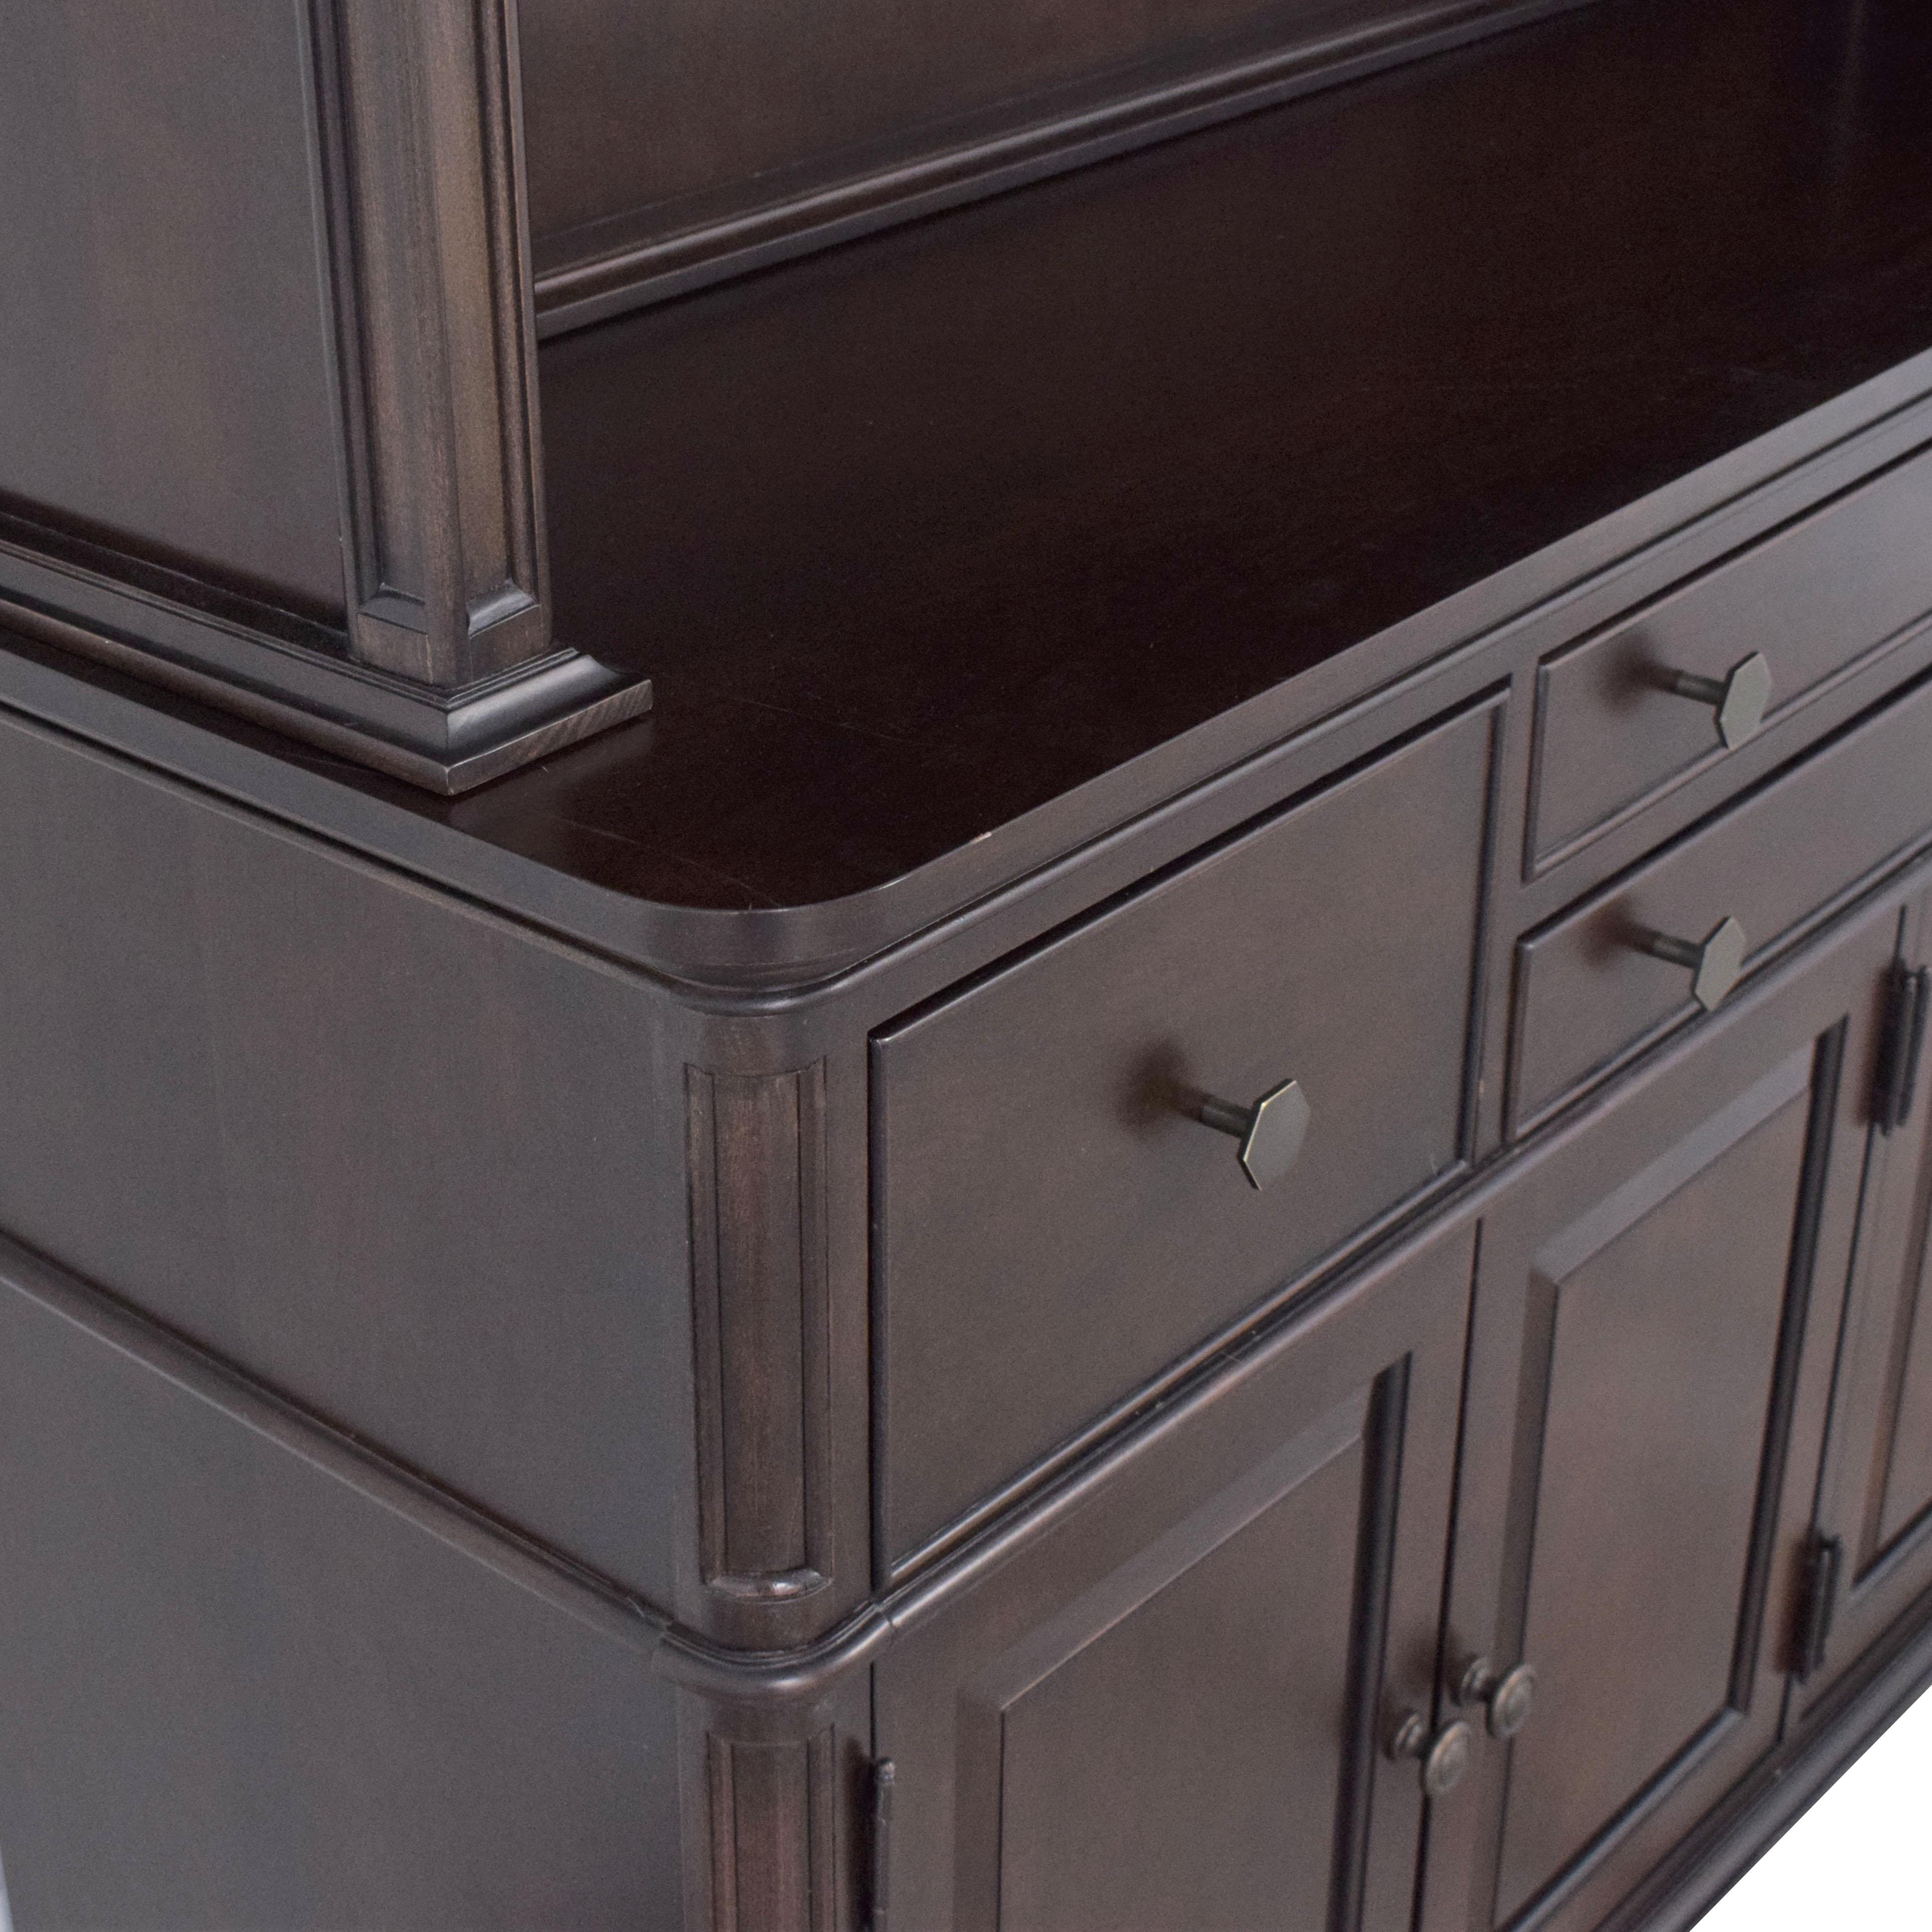 Universal Furniture Universal Furniture Credenza Cabinets & Sideboards